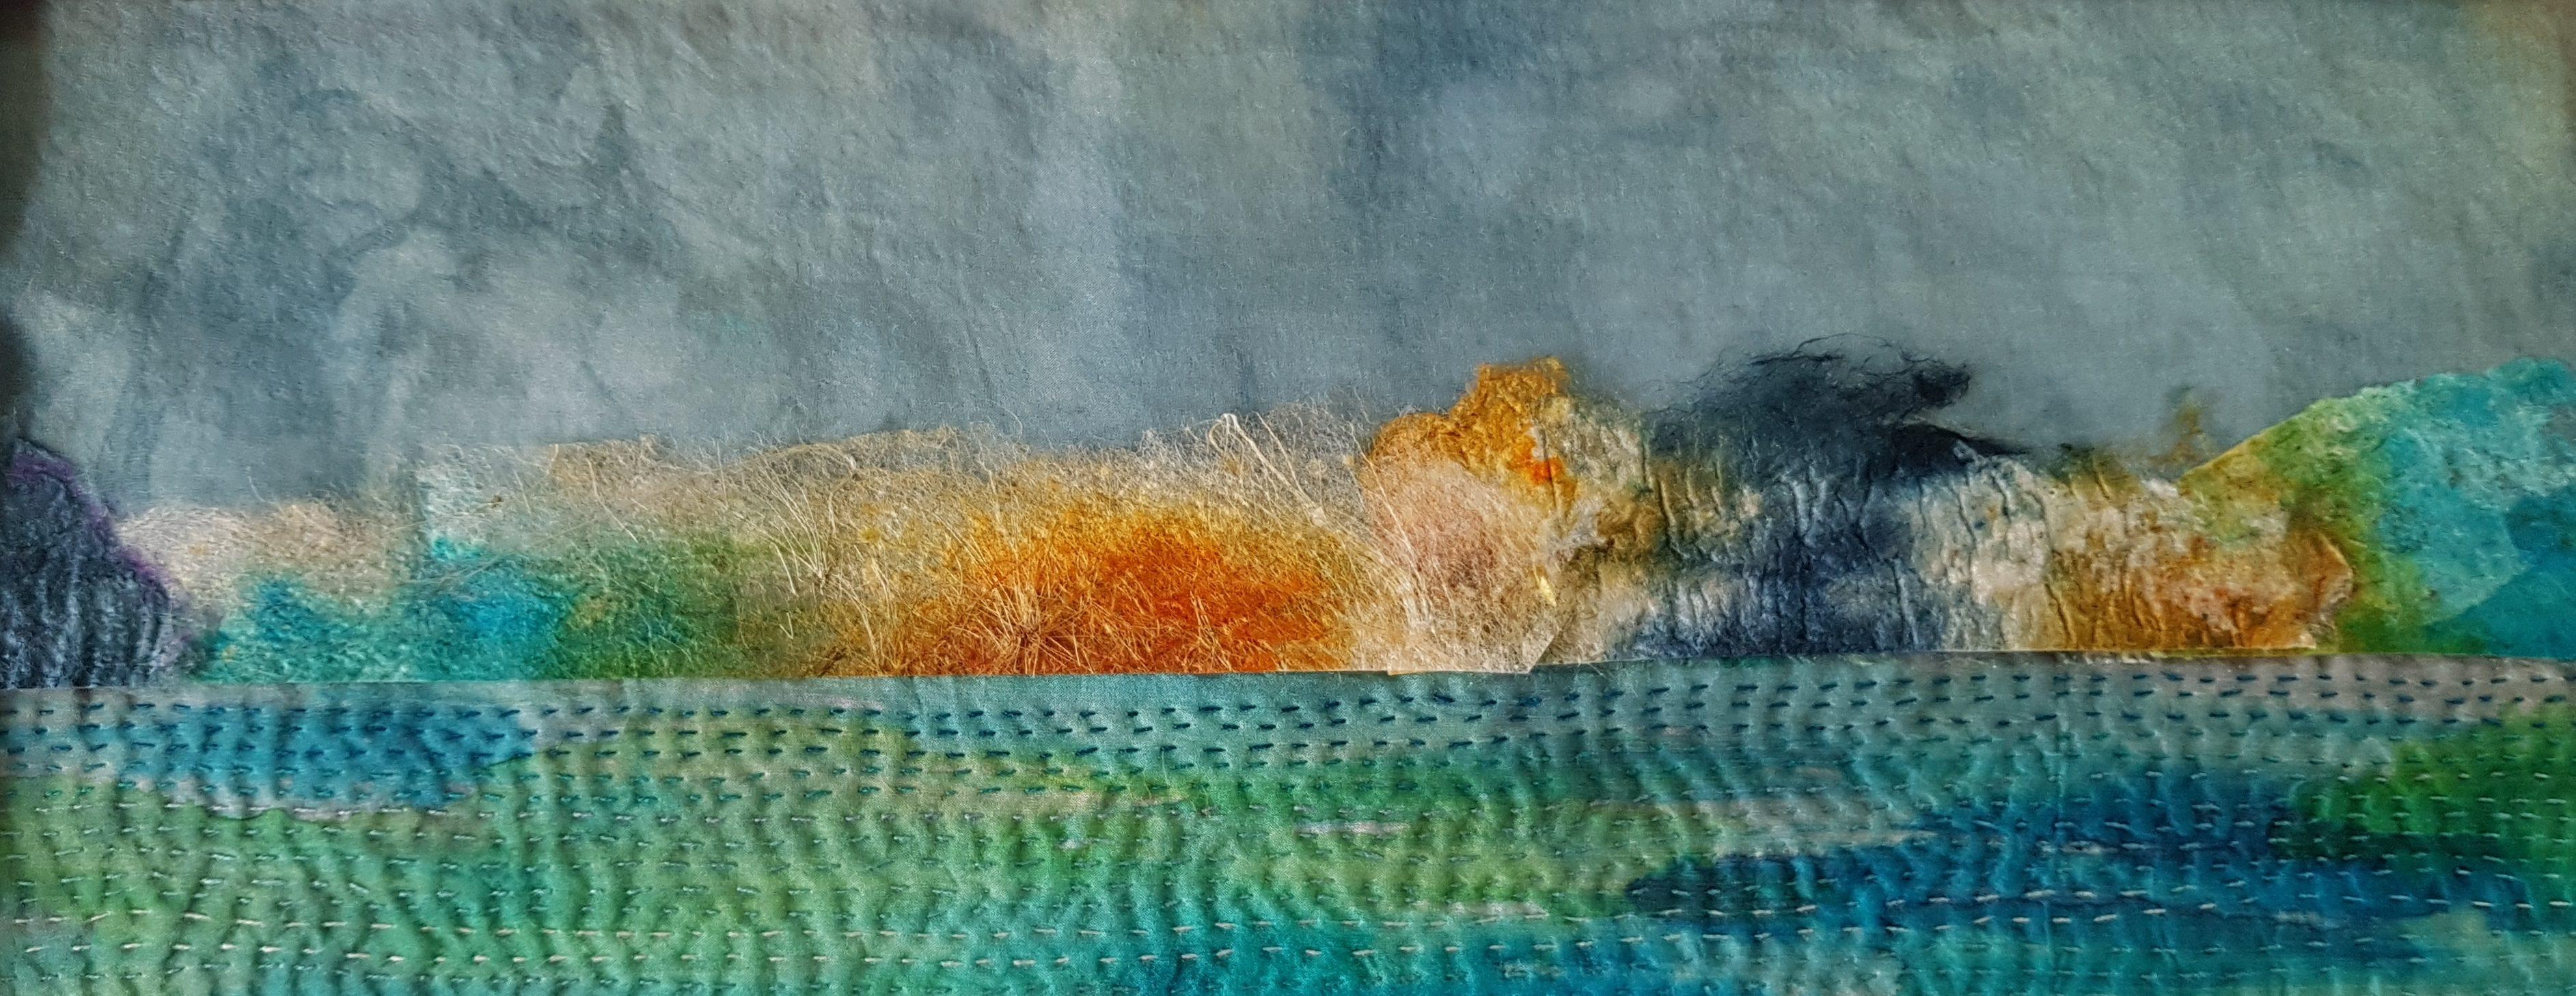 Horizon I, Kathrina Hughes, element15